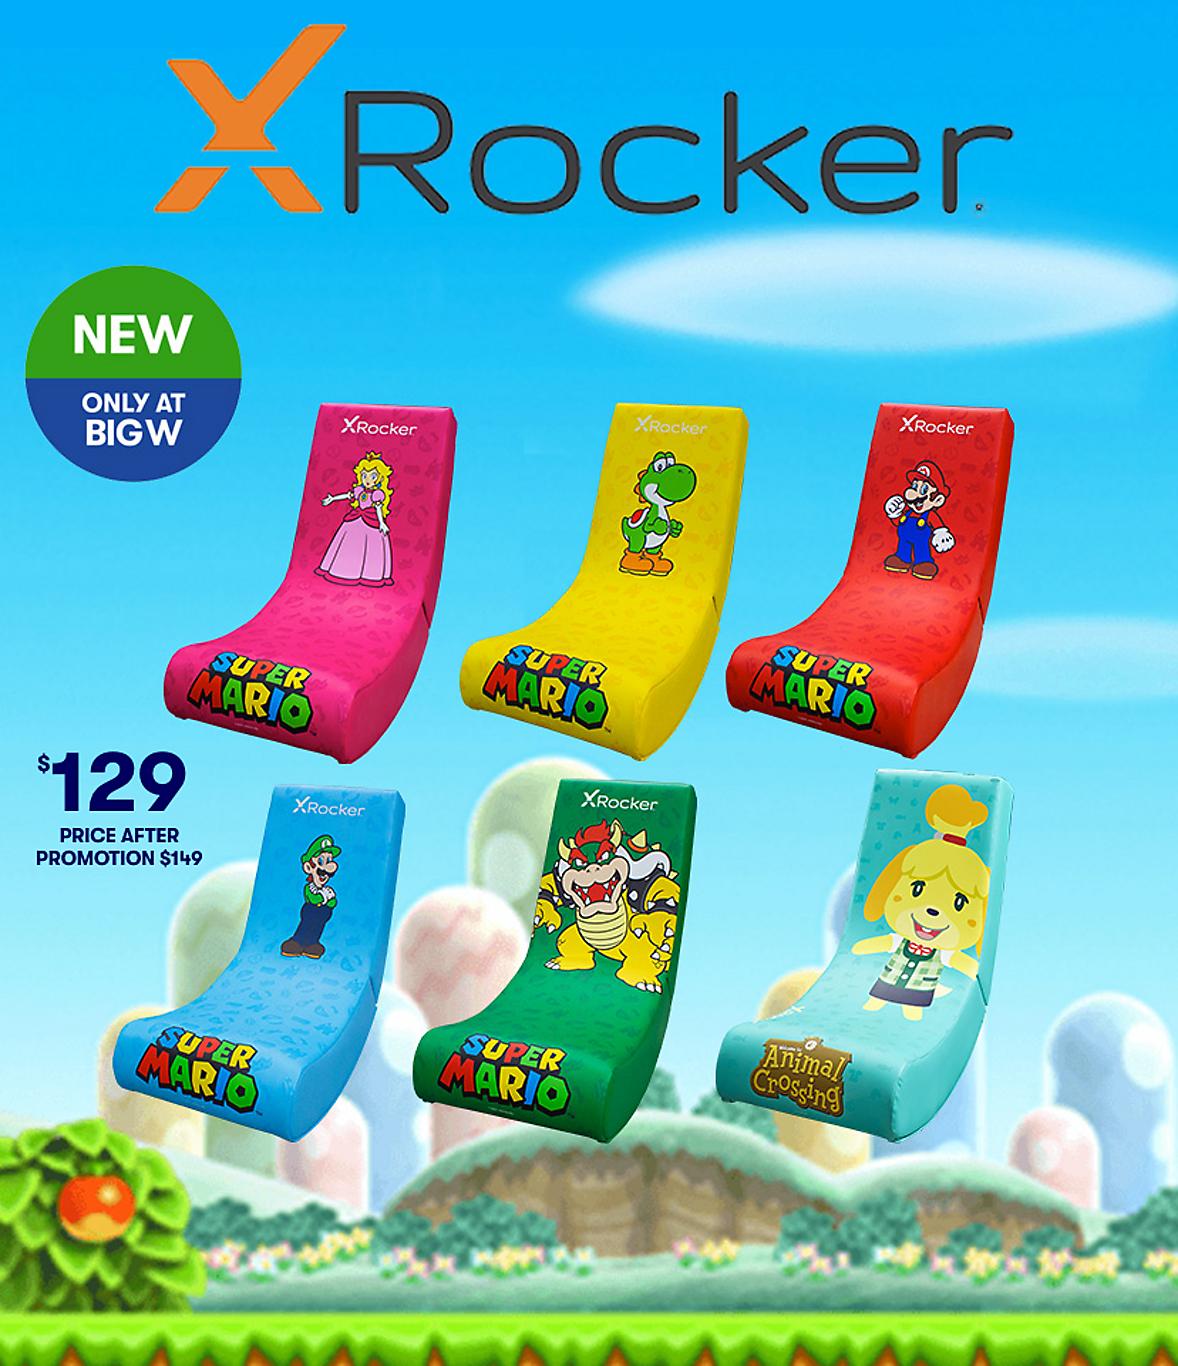 XRocker